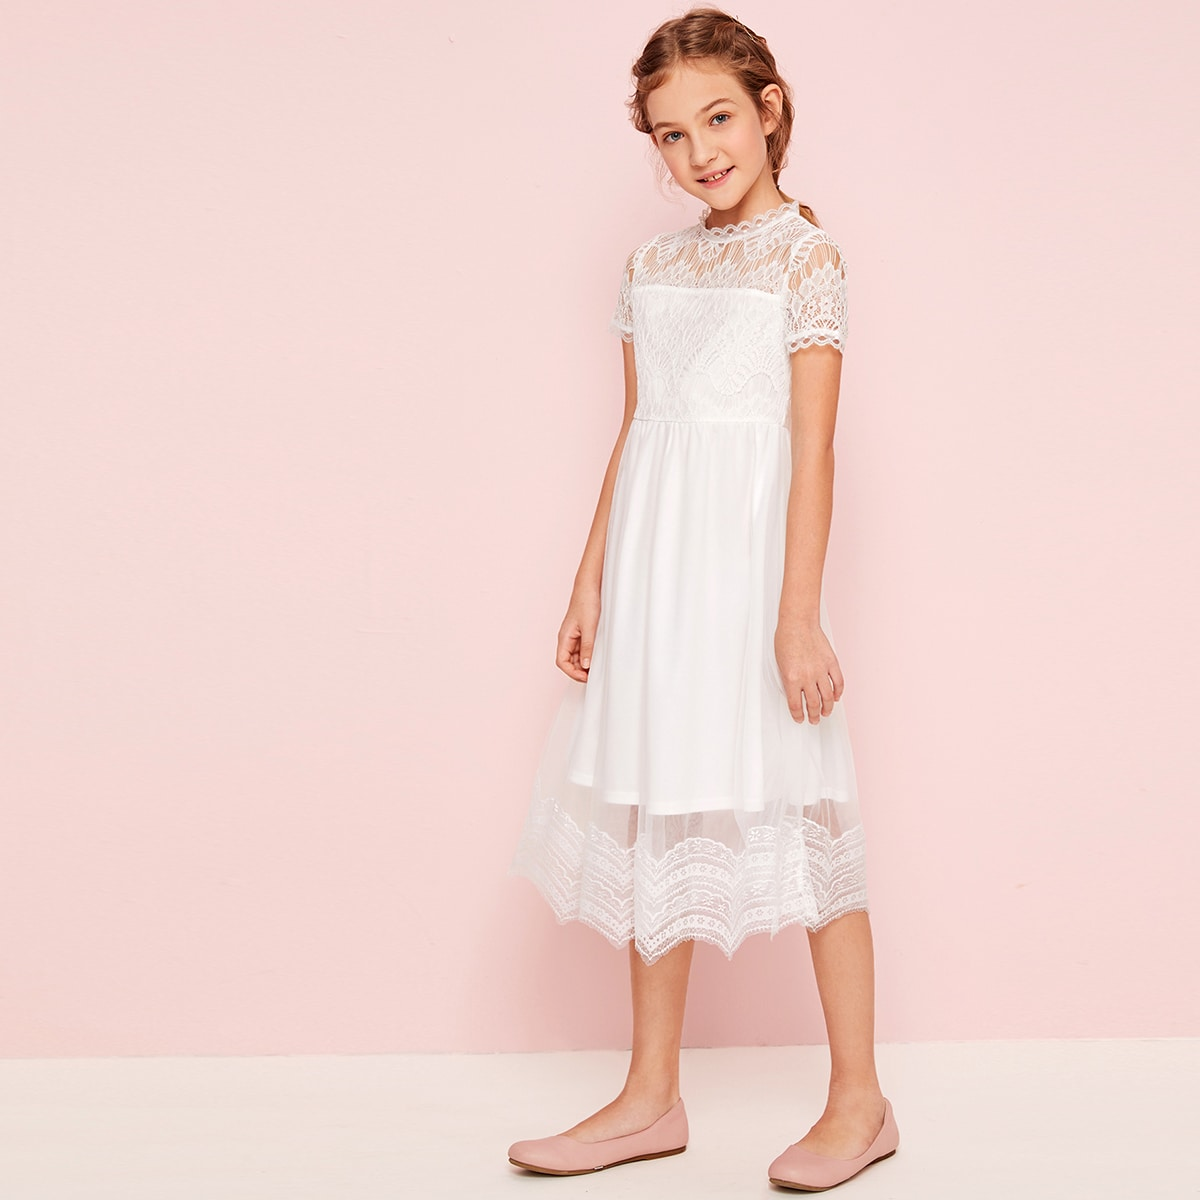 SHEIN / Girls Mock Neck Lace Bodice Mesh Flare Dress